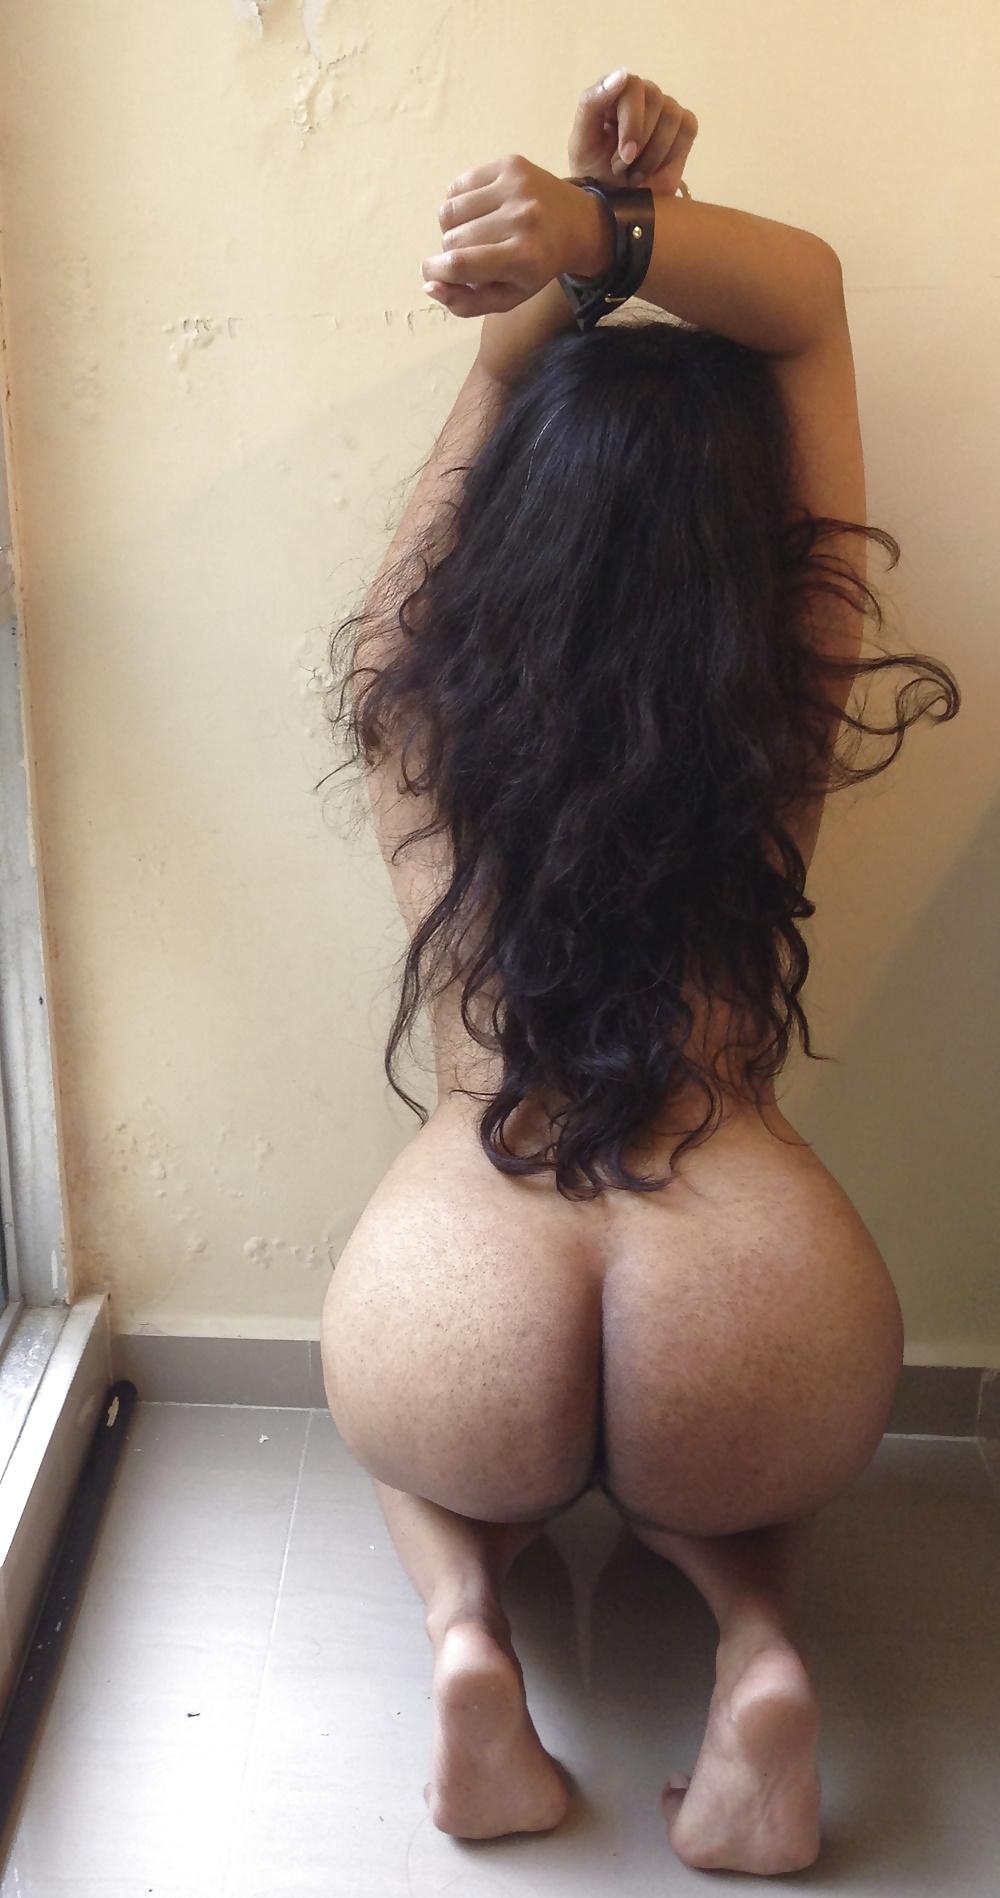 Thick ass indian girls, foto amerika latin naked girl